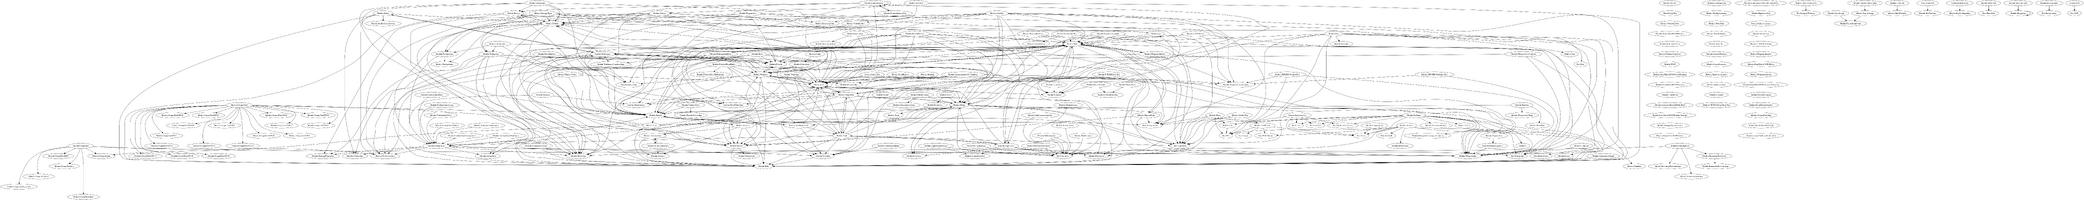 Wiki's codebase dependency graph as of 2021.08.07